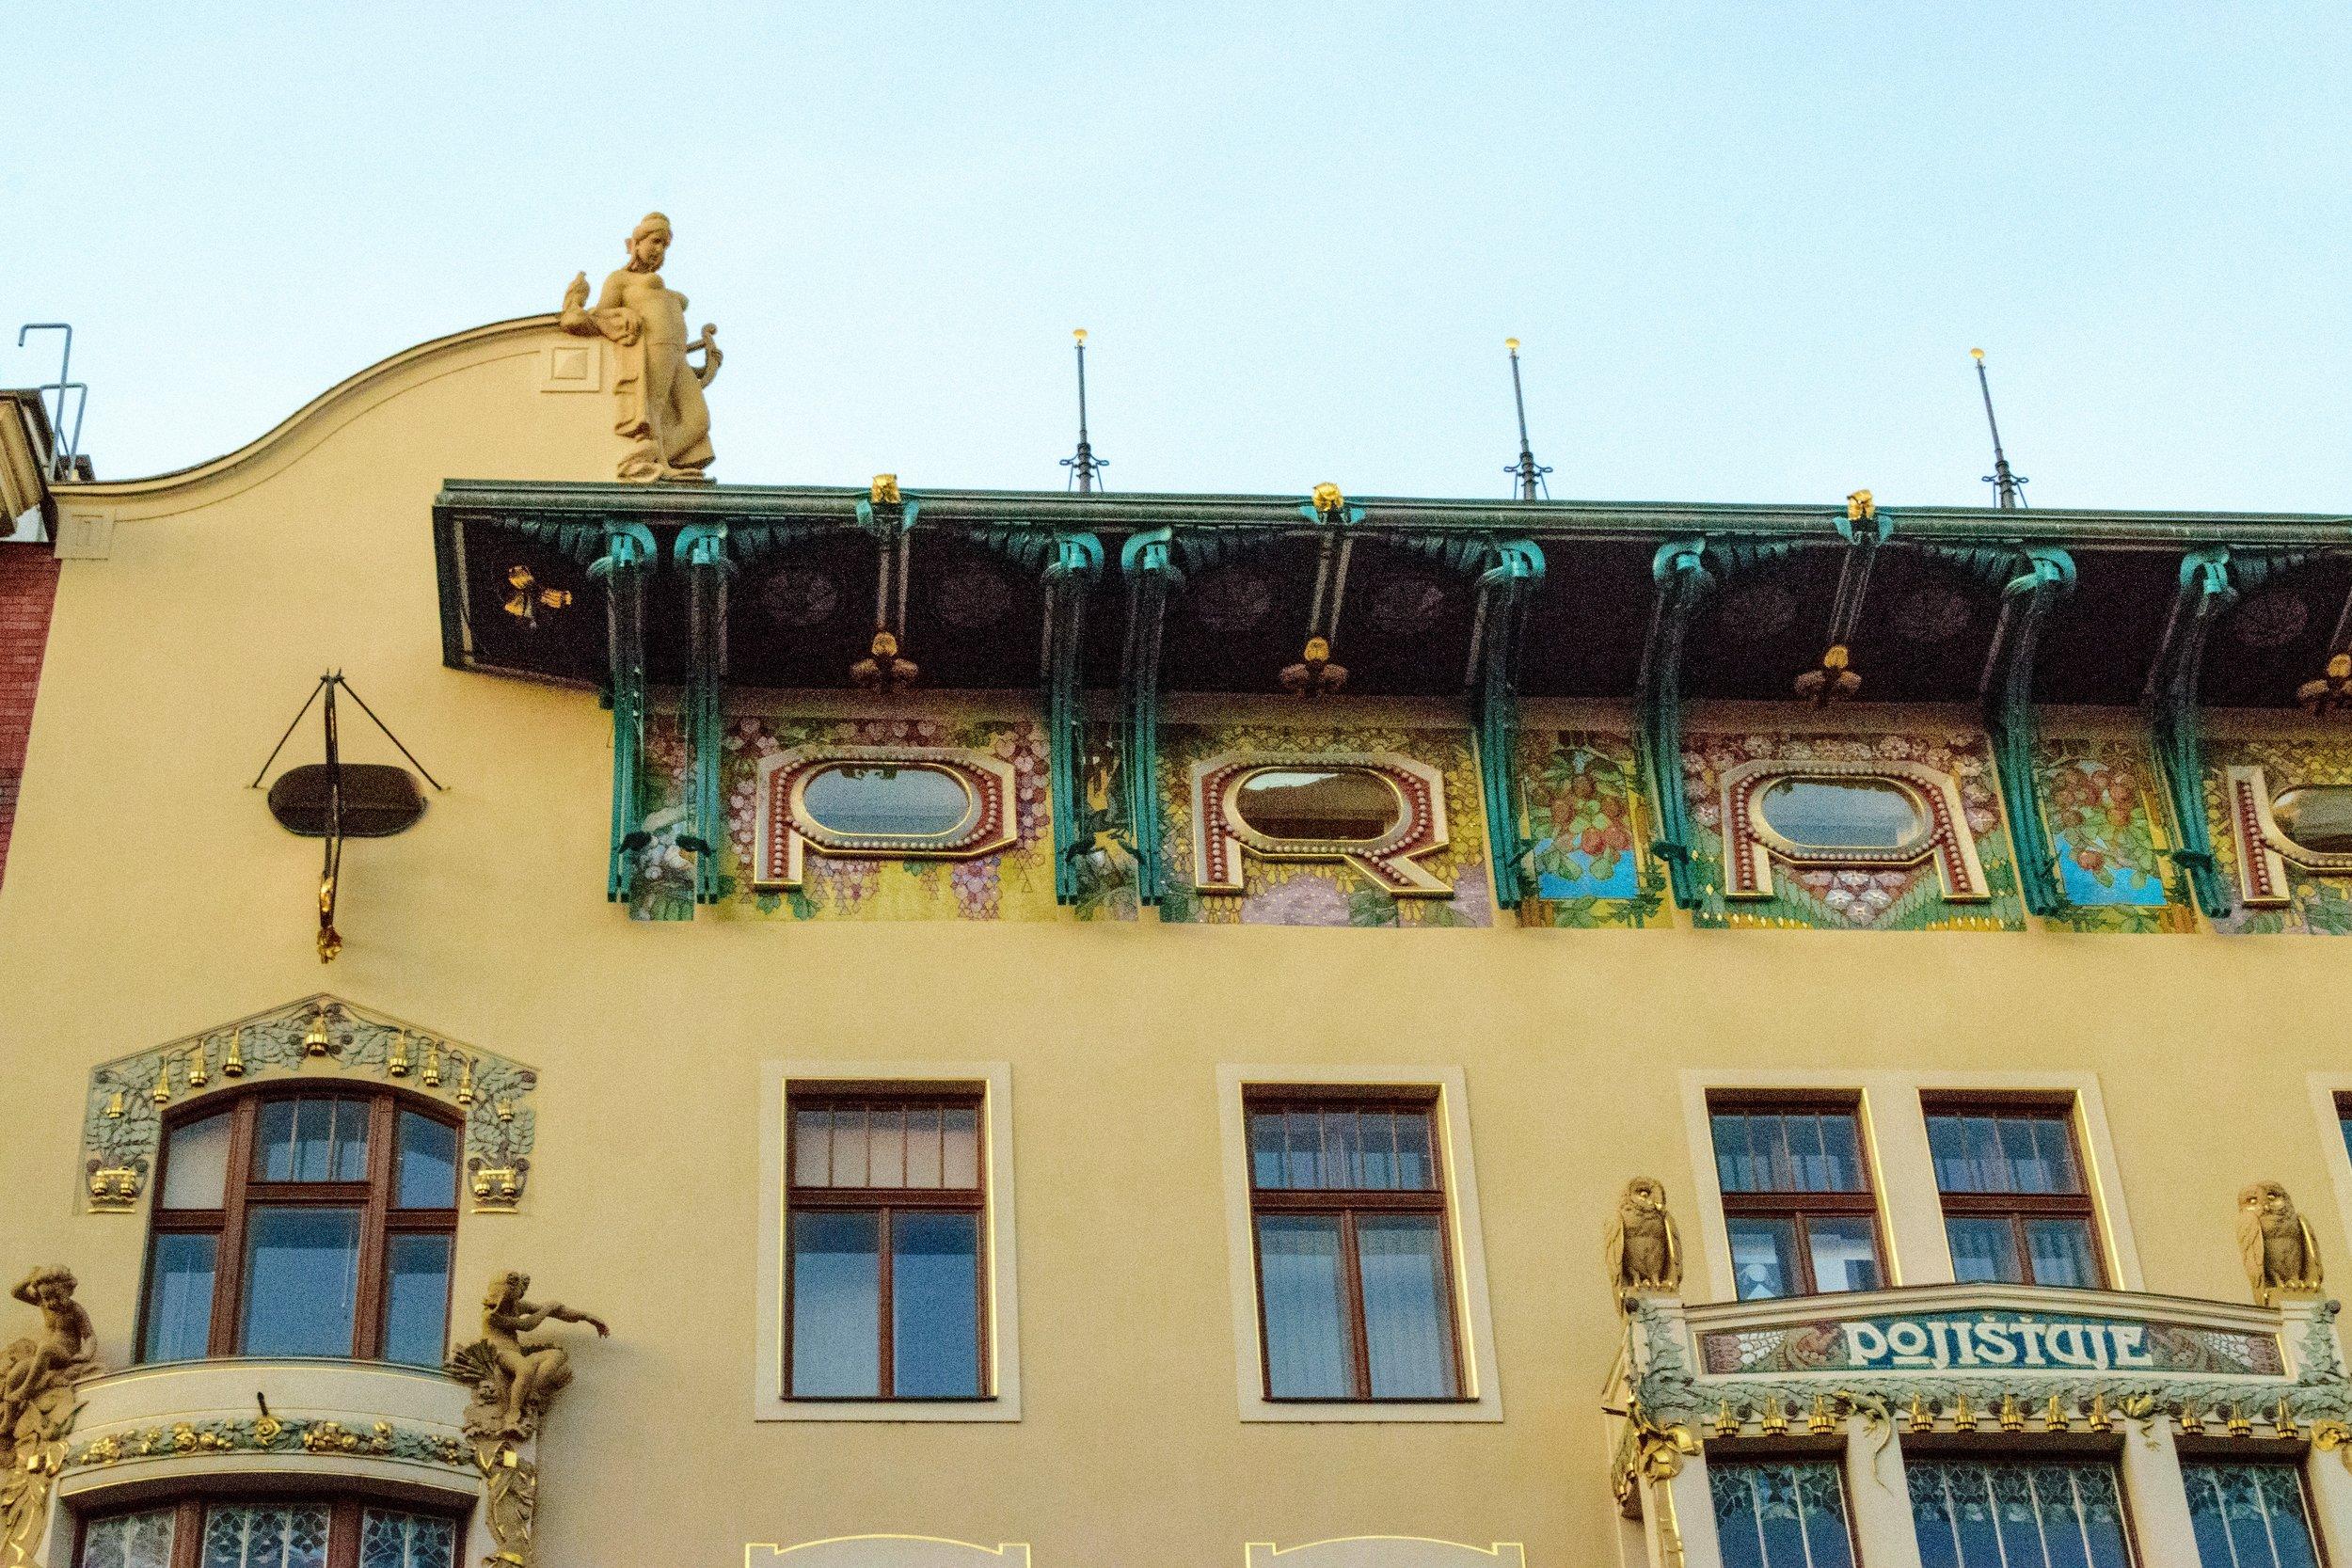 detail of the 1905 Praha Assurance building